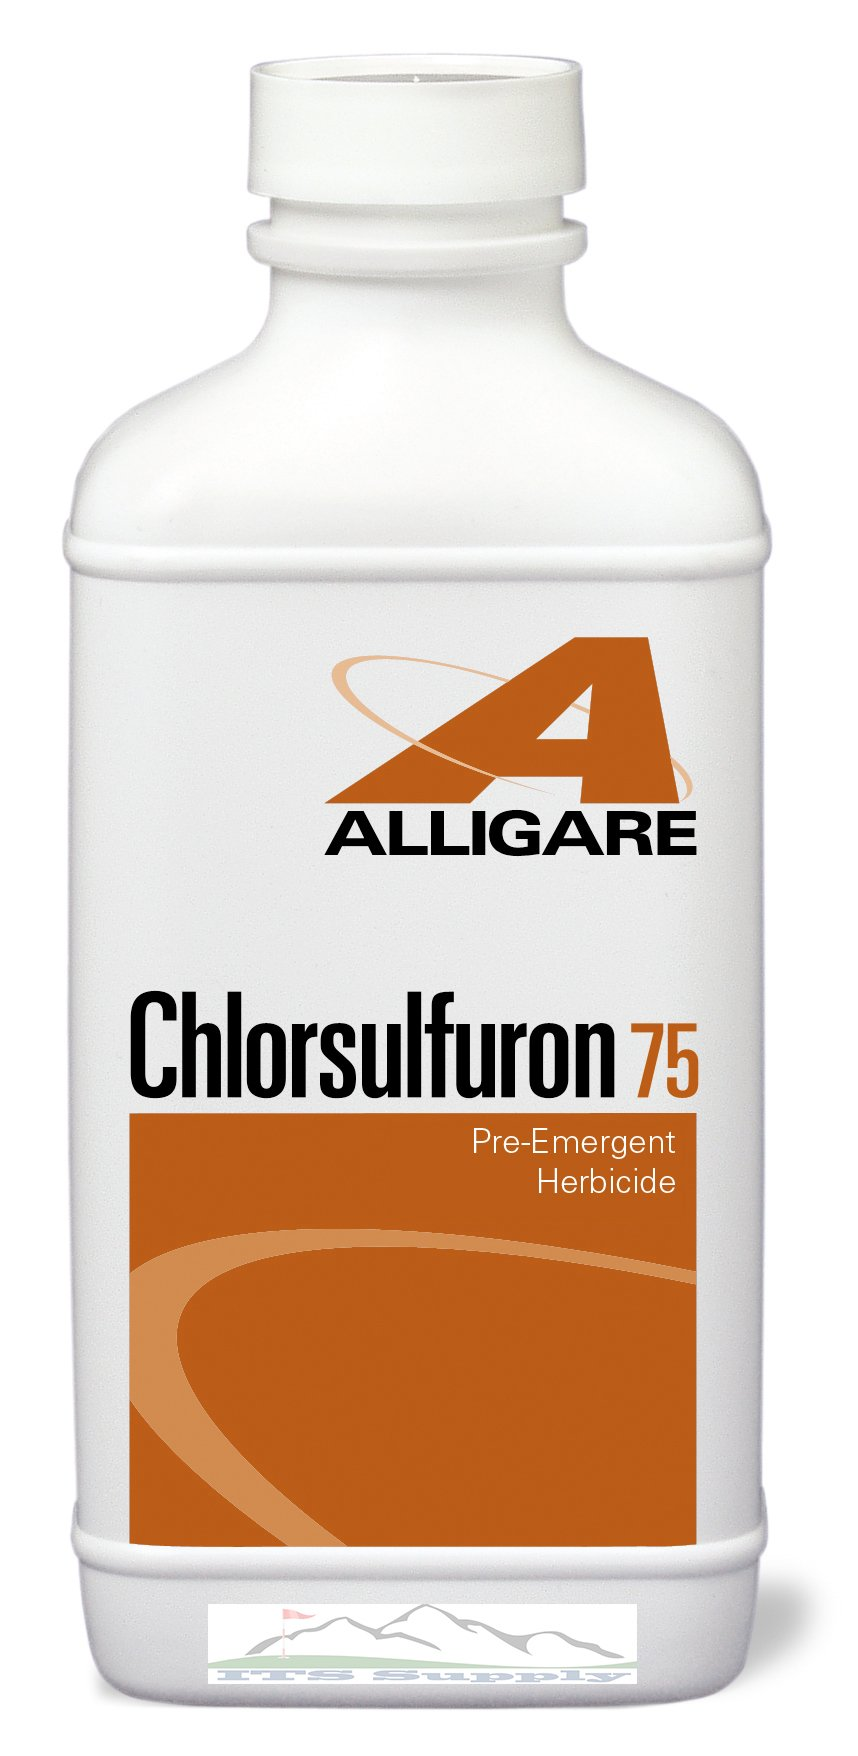 Chlorsulfuron 75 WDG Herbicide 8 ounce bottle replaces Telar XP by Chlorsulfuron